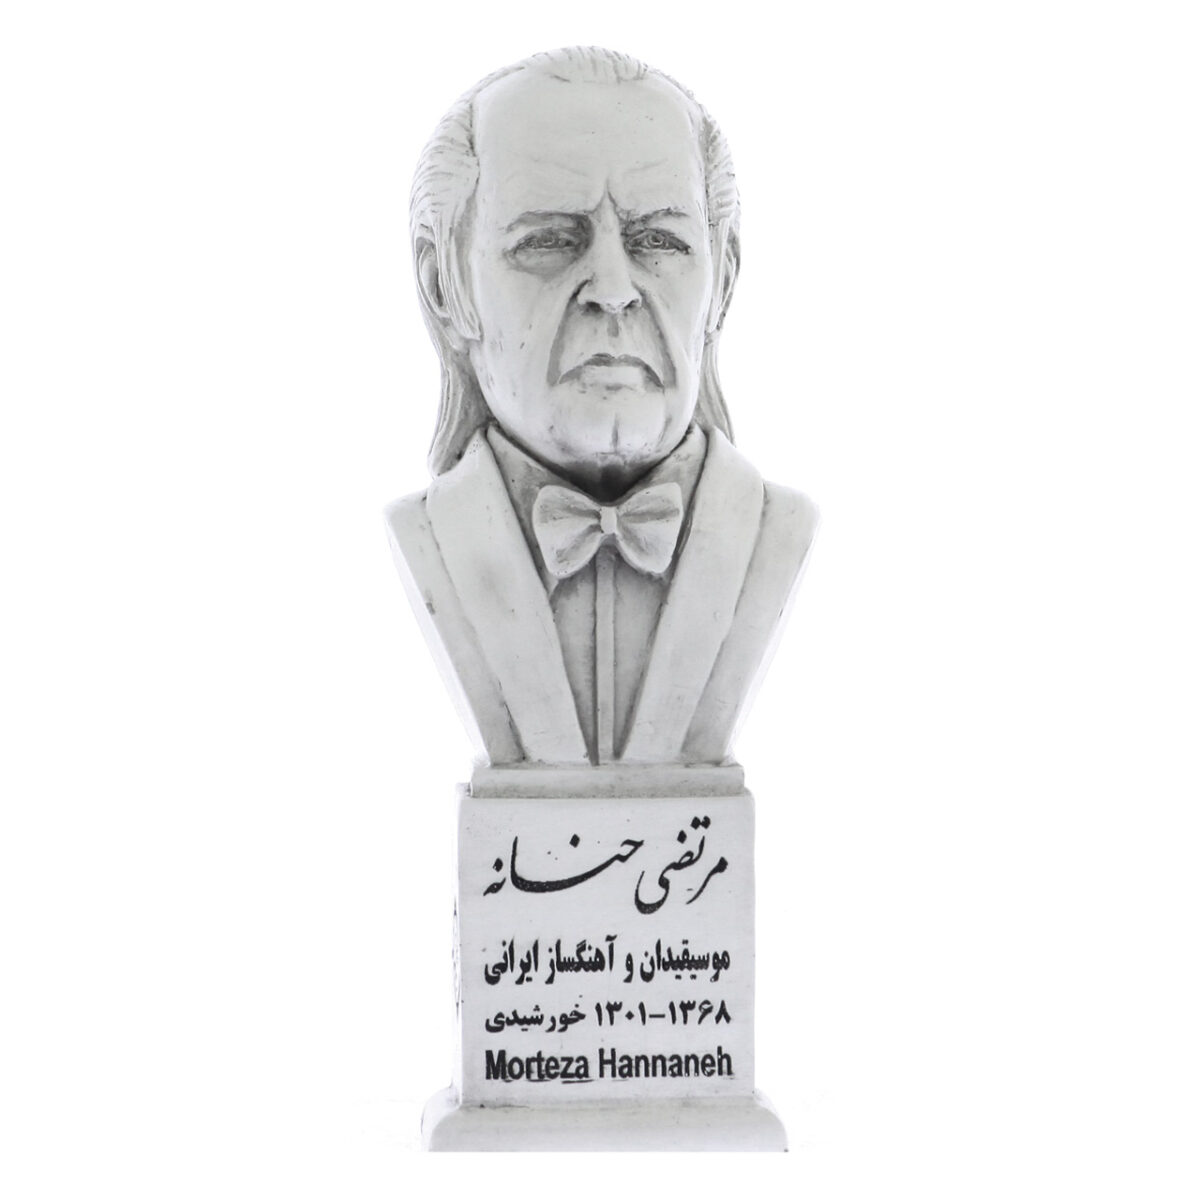 morteza hanane s 1200x1200 - سردیس استاد مرتضی حنانه